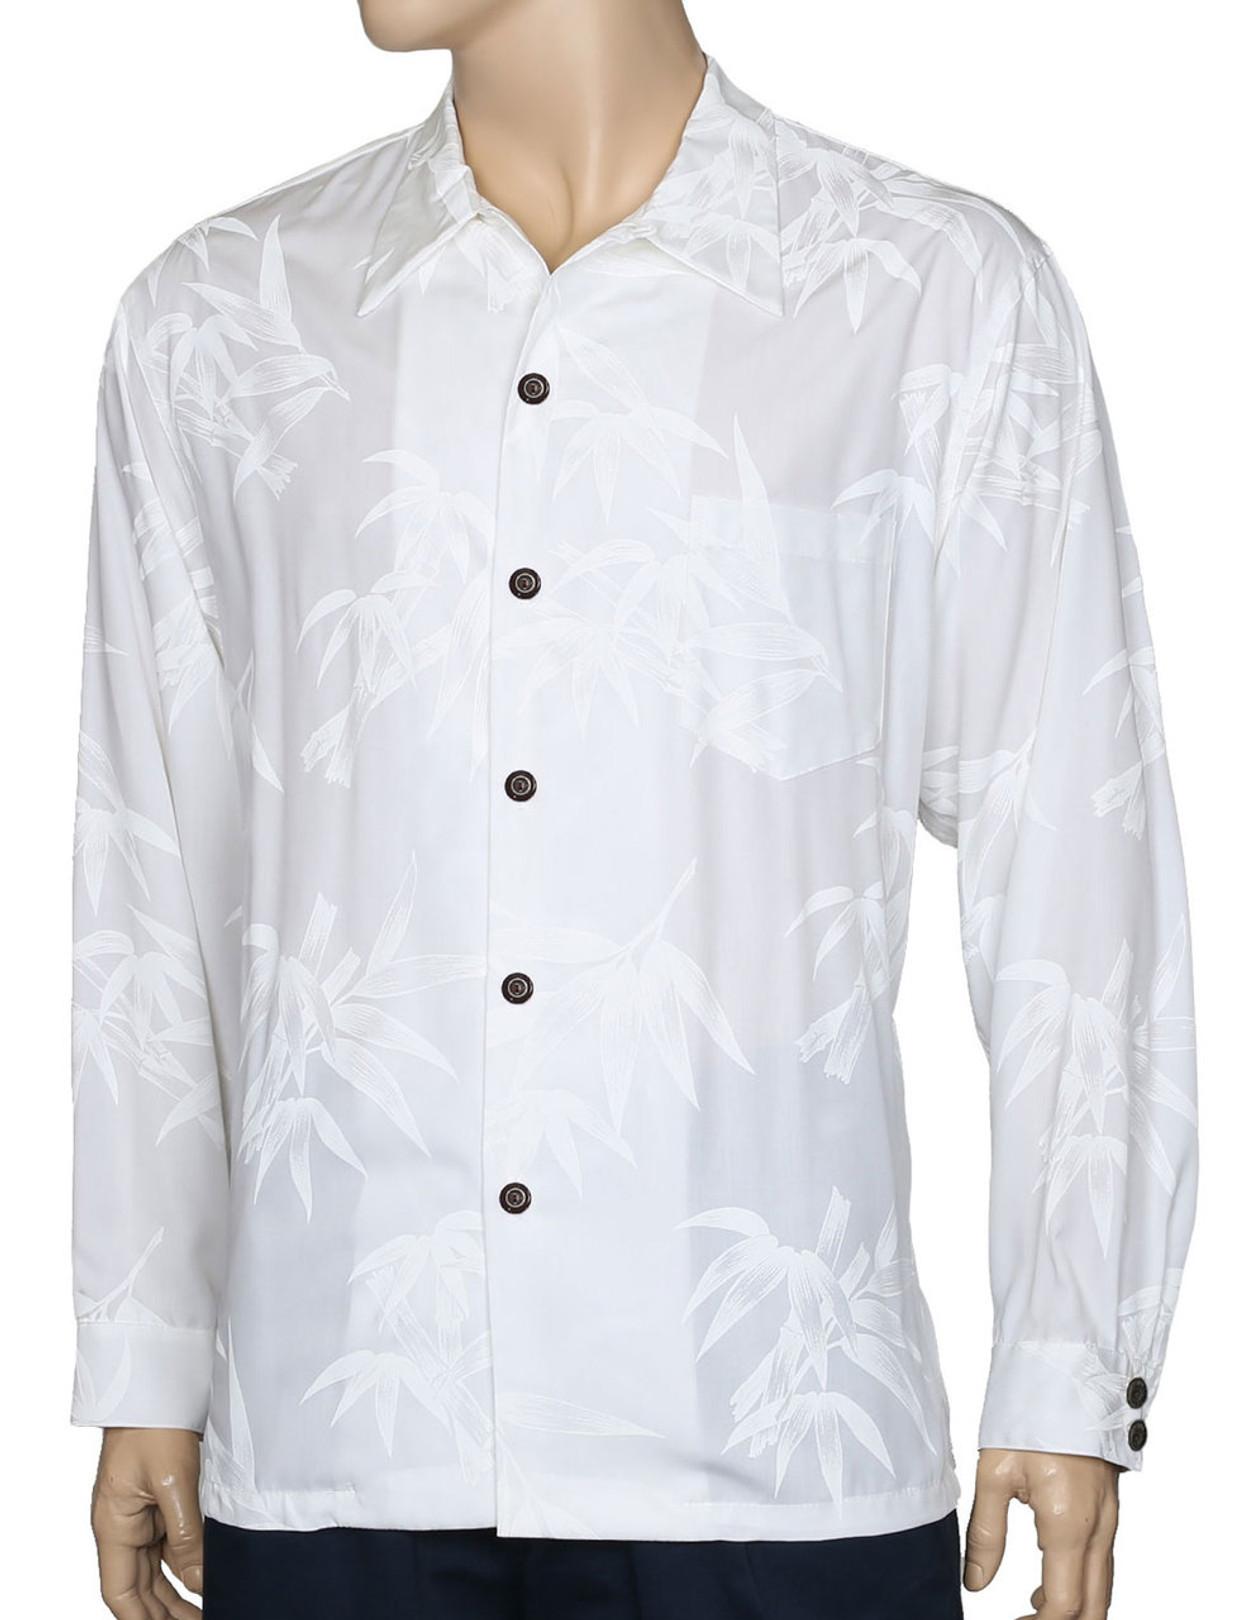 81e67f79 White Wedding Hawaiian Shirt Long Sleeves Bamboo 100% Quality Rayon Poplin  Hidden Button-Up